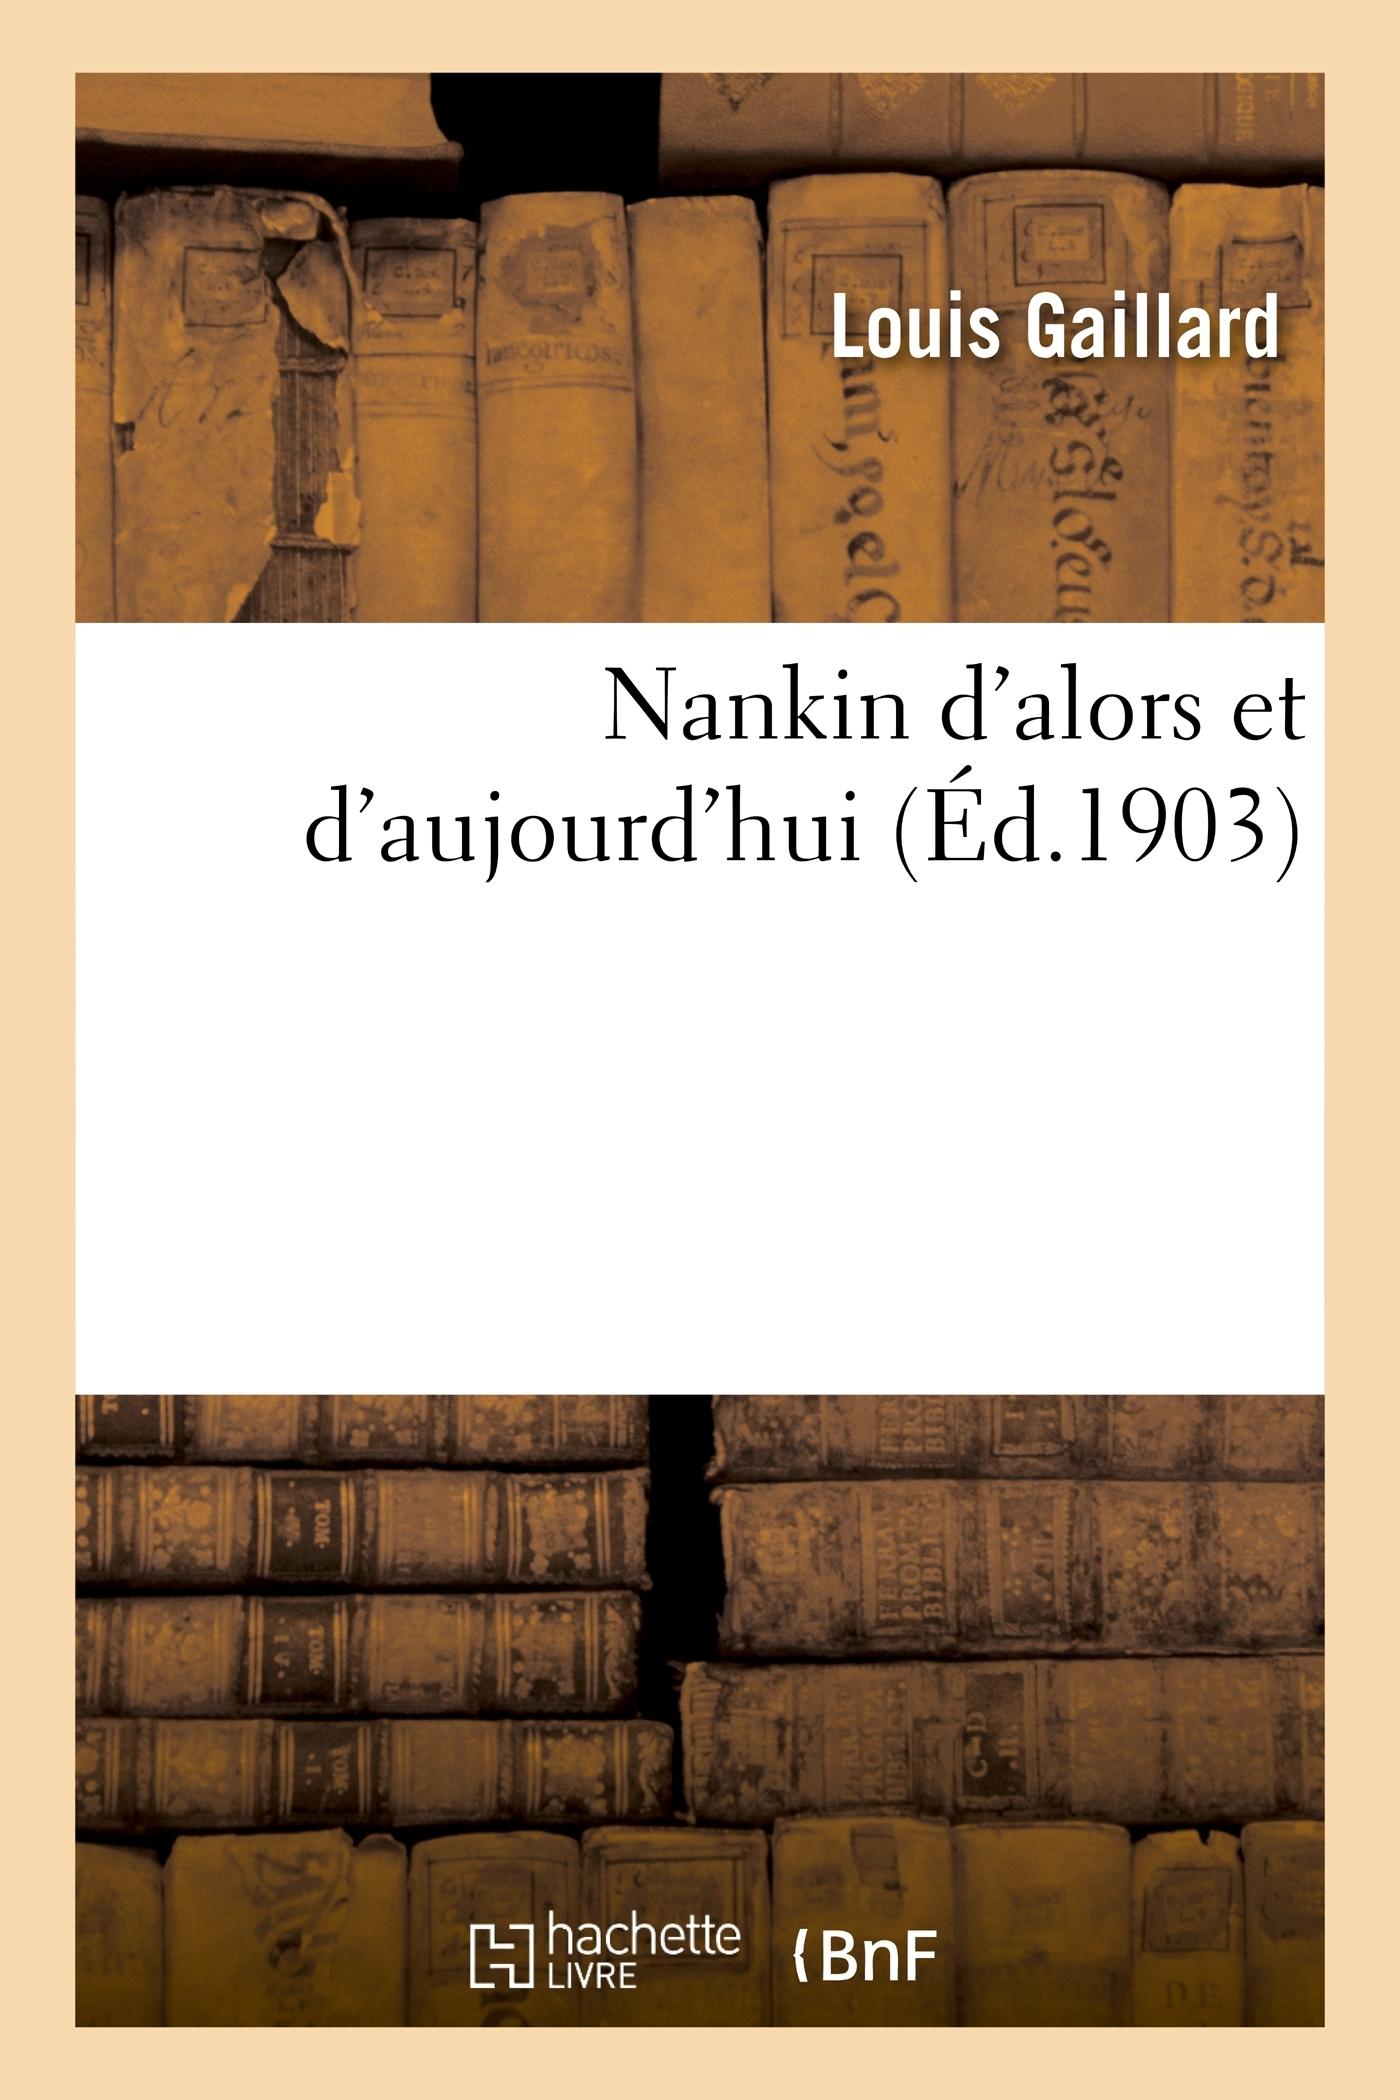 NANKIN D'ALORS ET D'AUJOURD'HUI